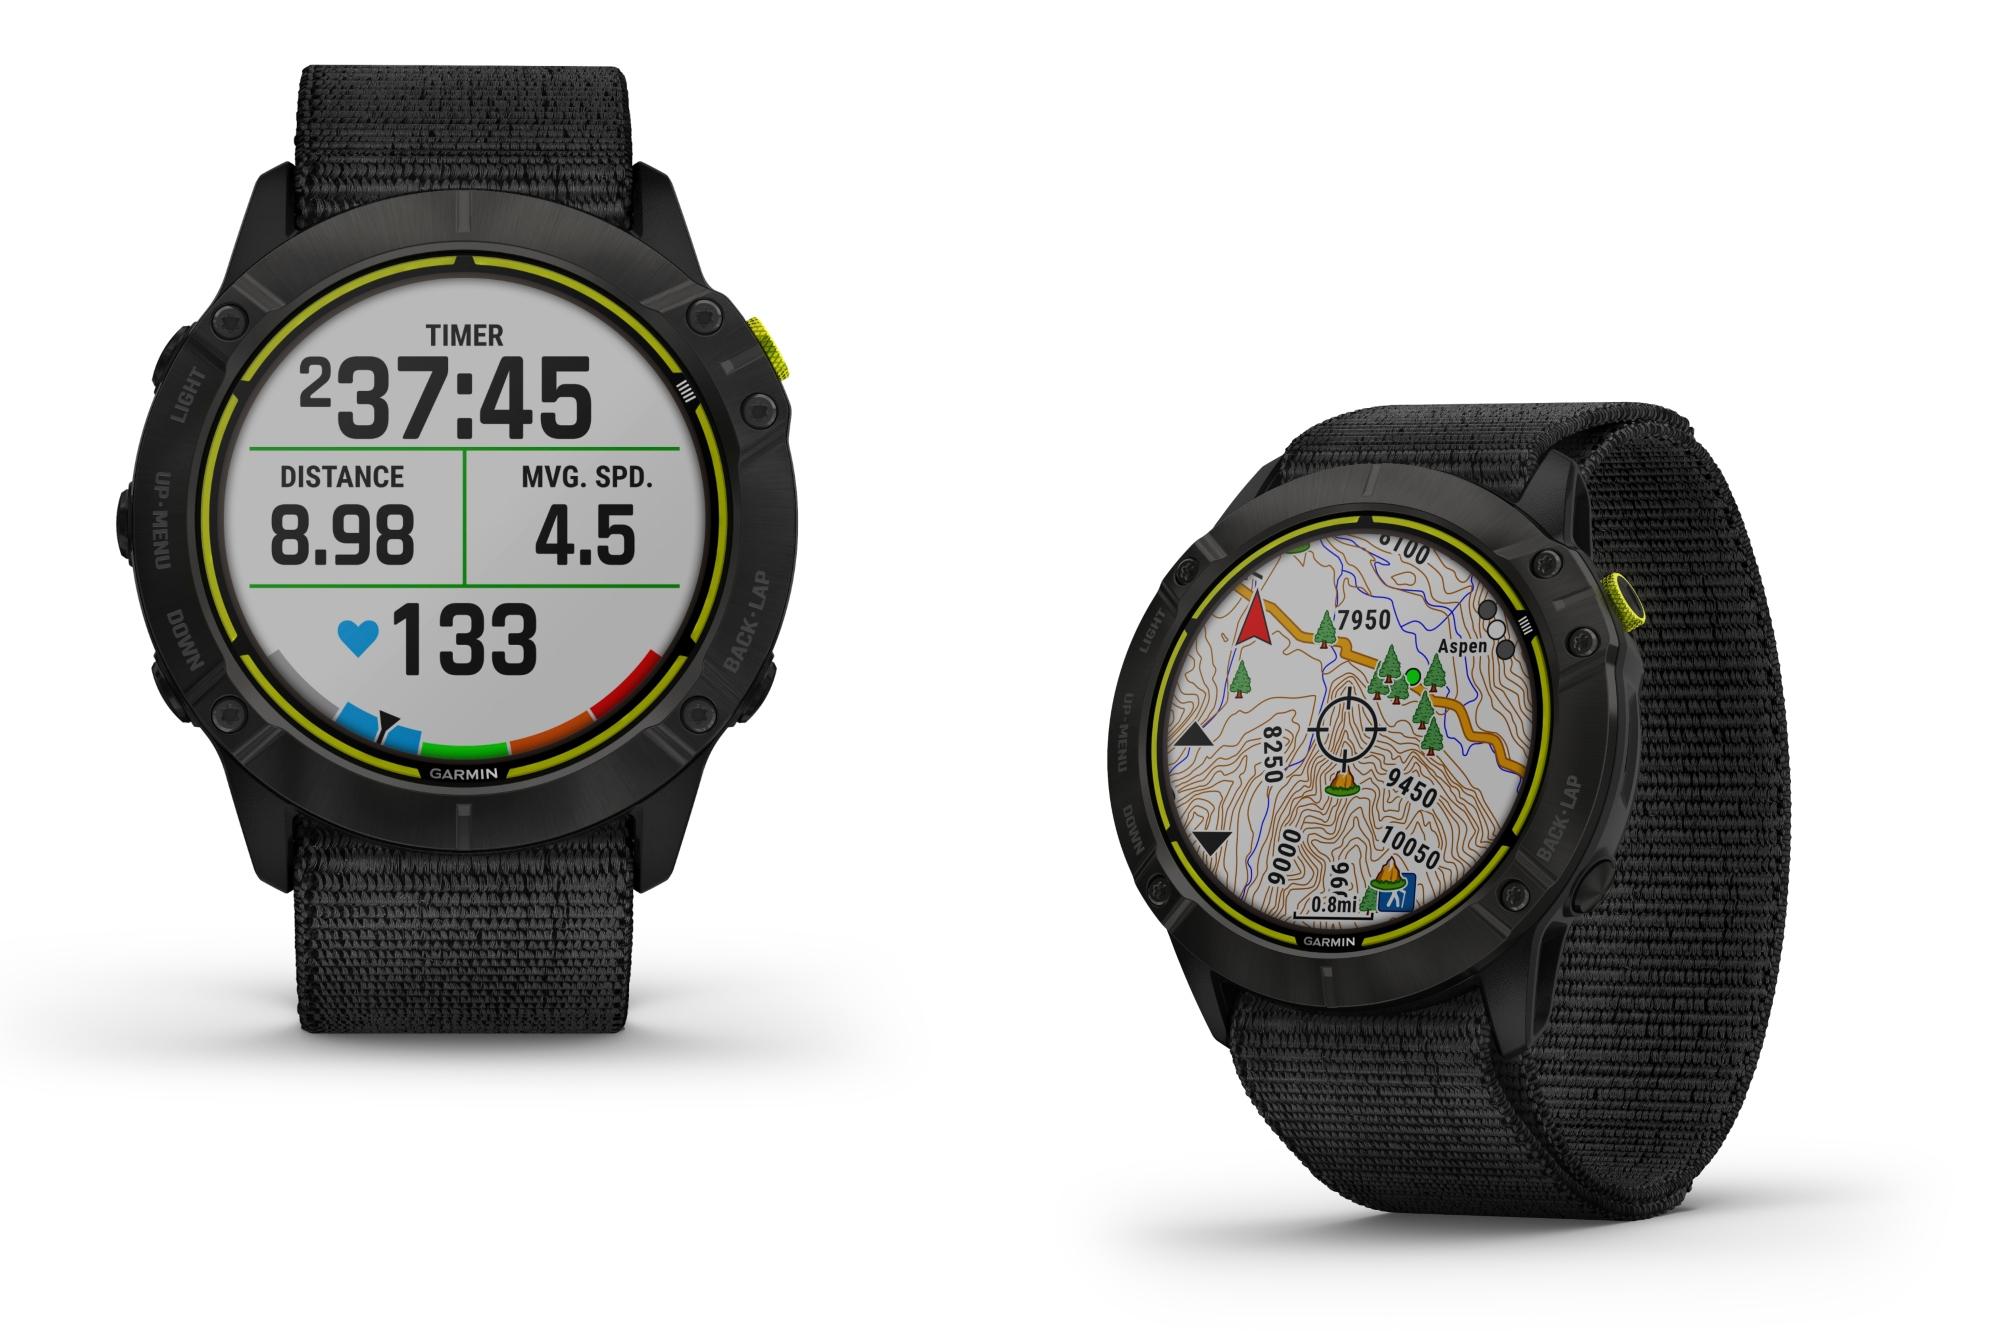 Garmin launches new Enduro watch